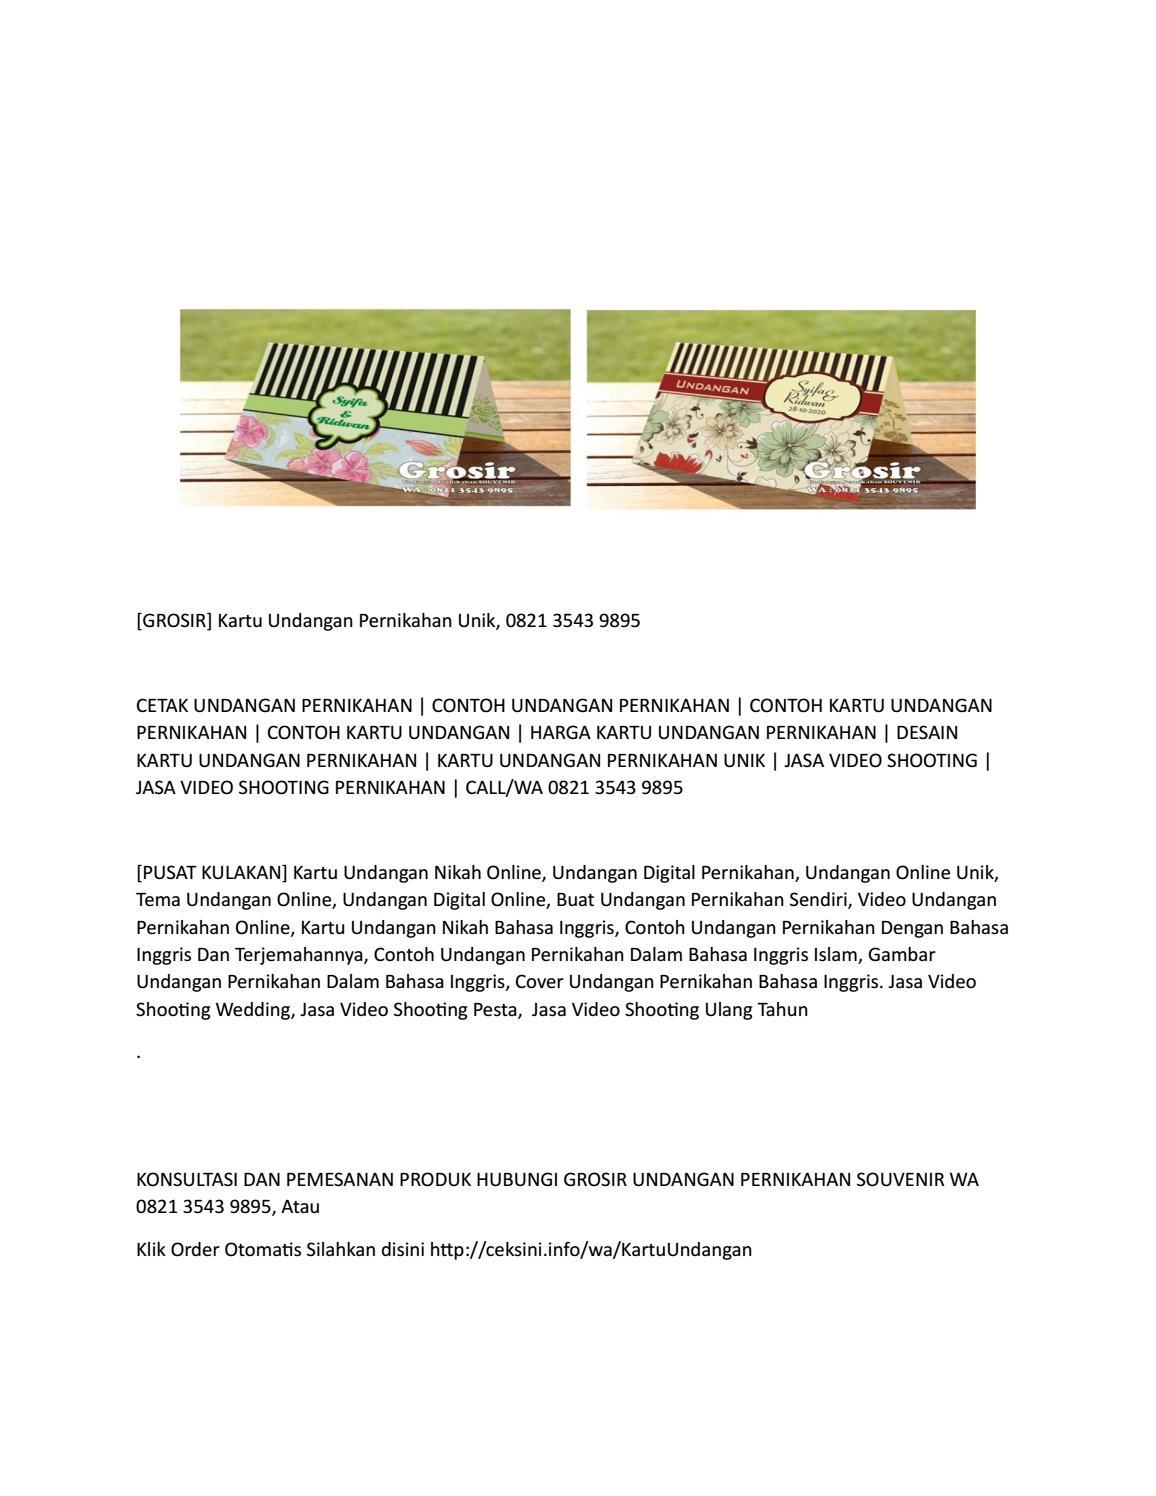 Grosir Kartu Undangan Pernikahan Unik 0821 3543 9895 By Cetakkartuundangansuper Issuu